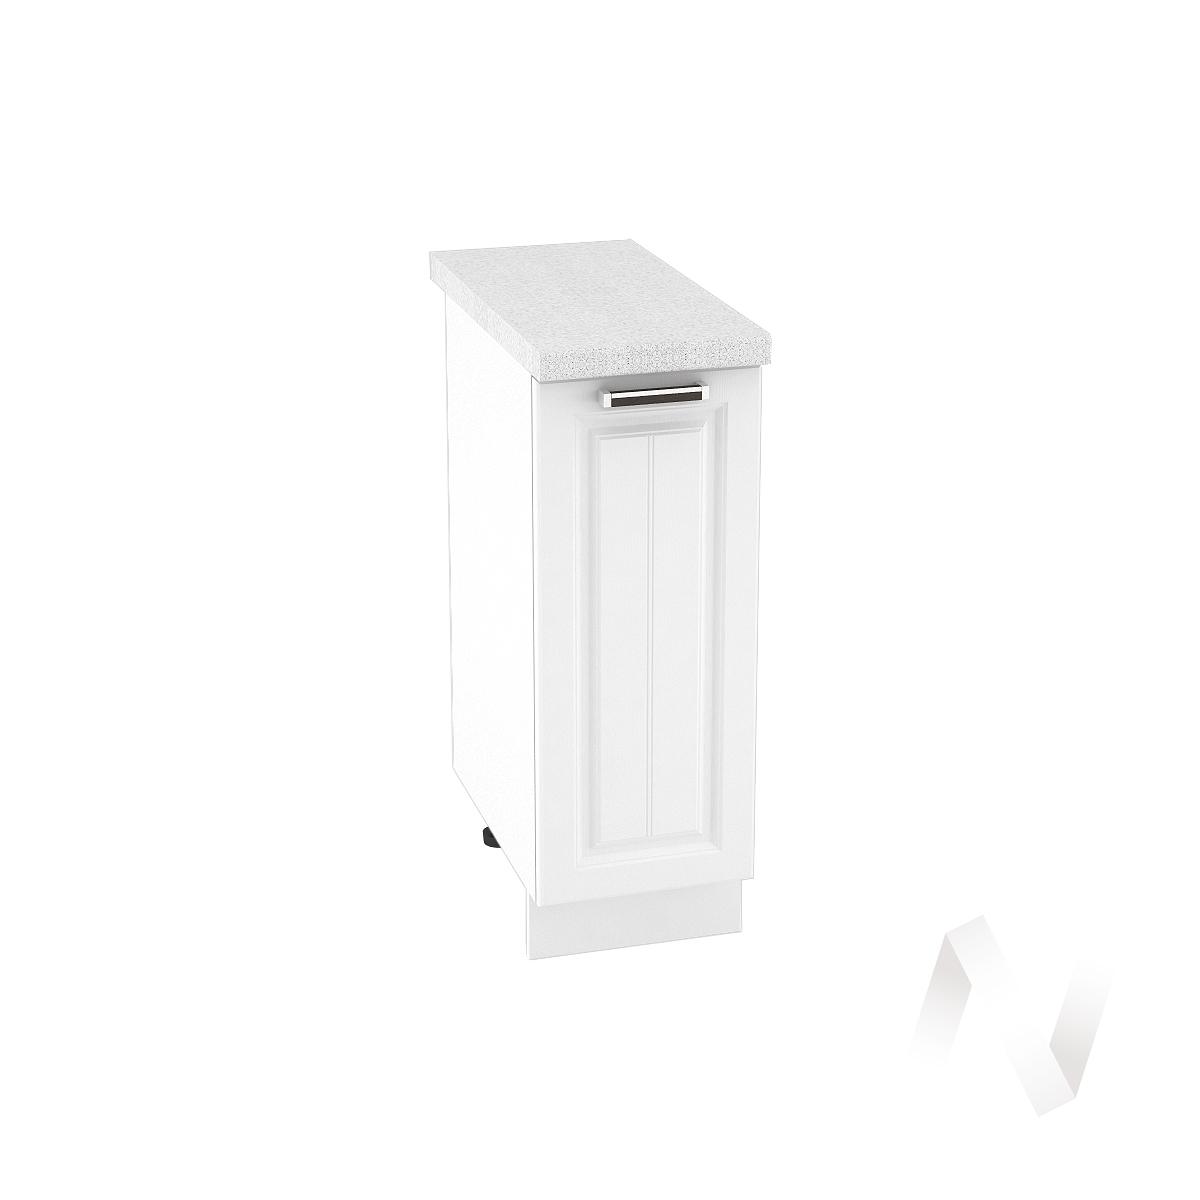 "Кухня ""Прага"": Шкаф нижний 300, ШН 300 (белое дерево/корпус белый)"